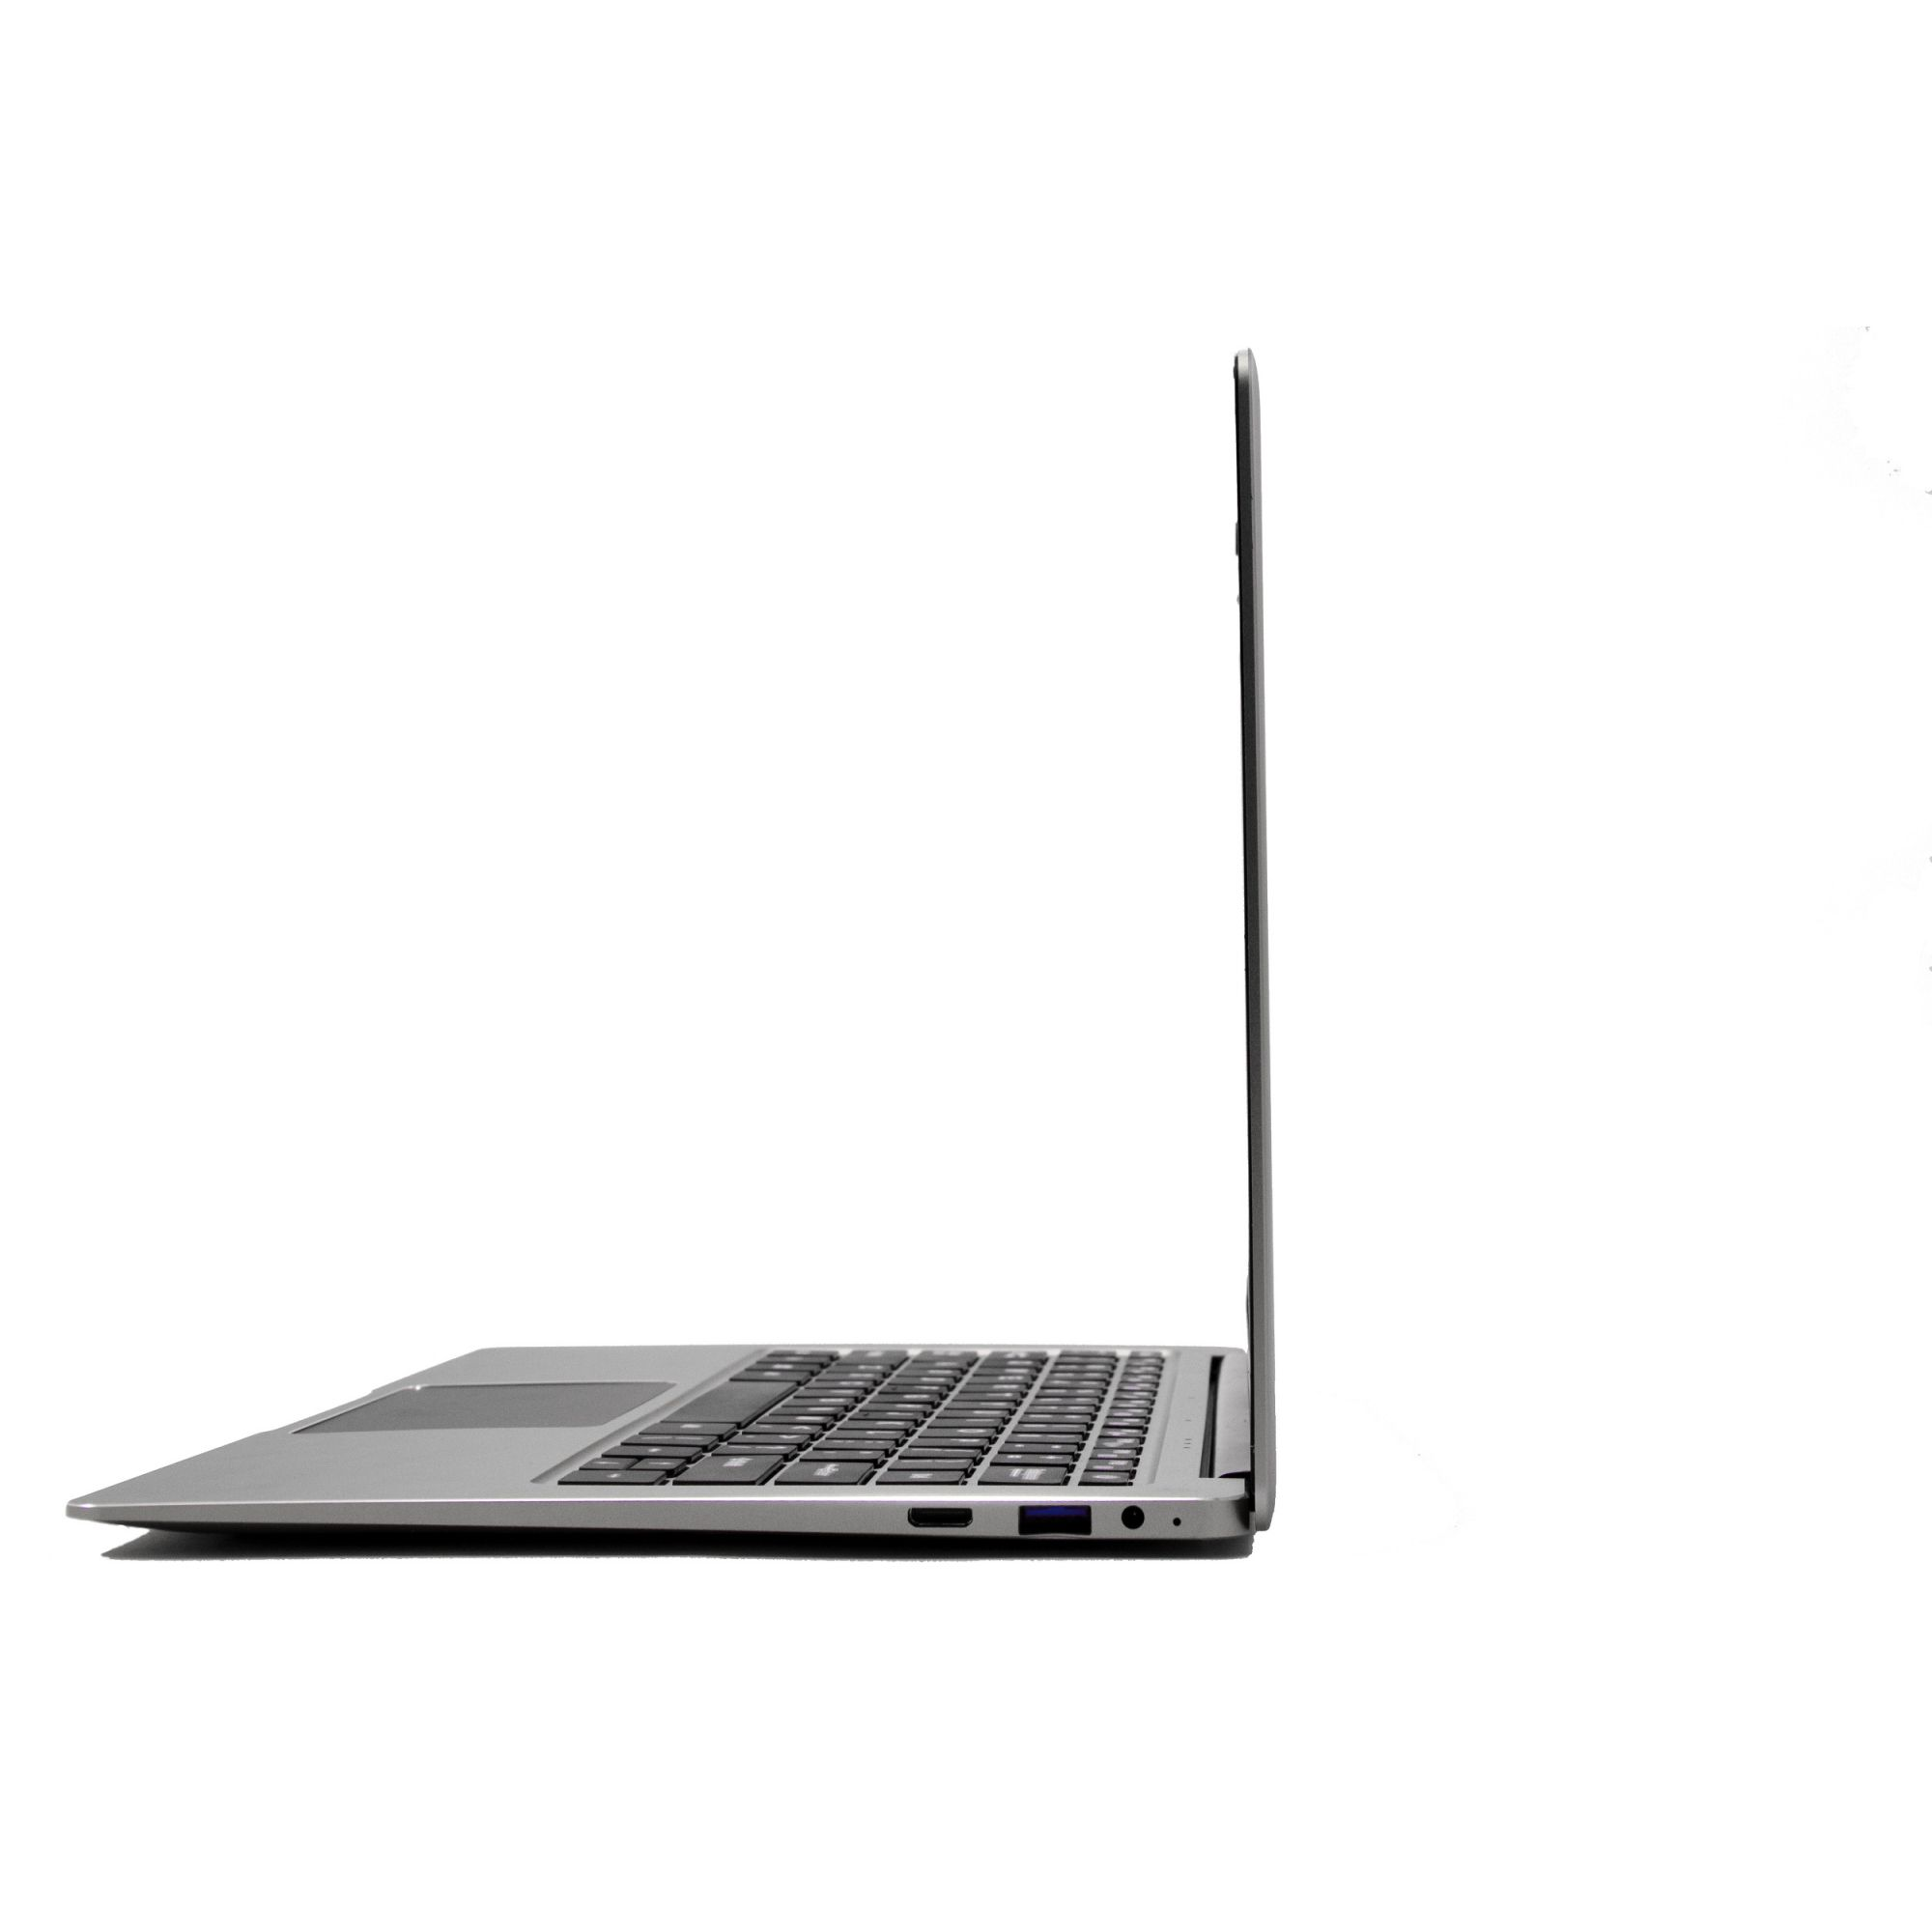 Notebook Happy Intel Celeron Tela 13.3 2gb Prata Windows 10